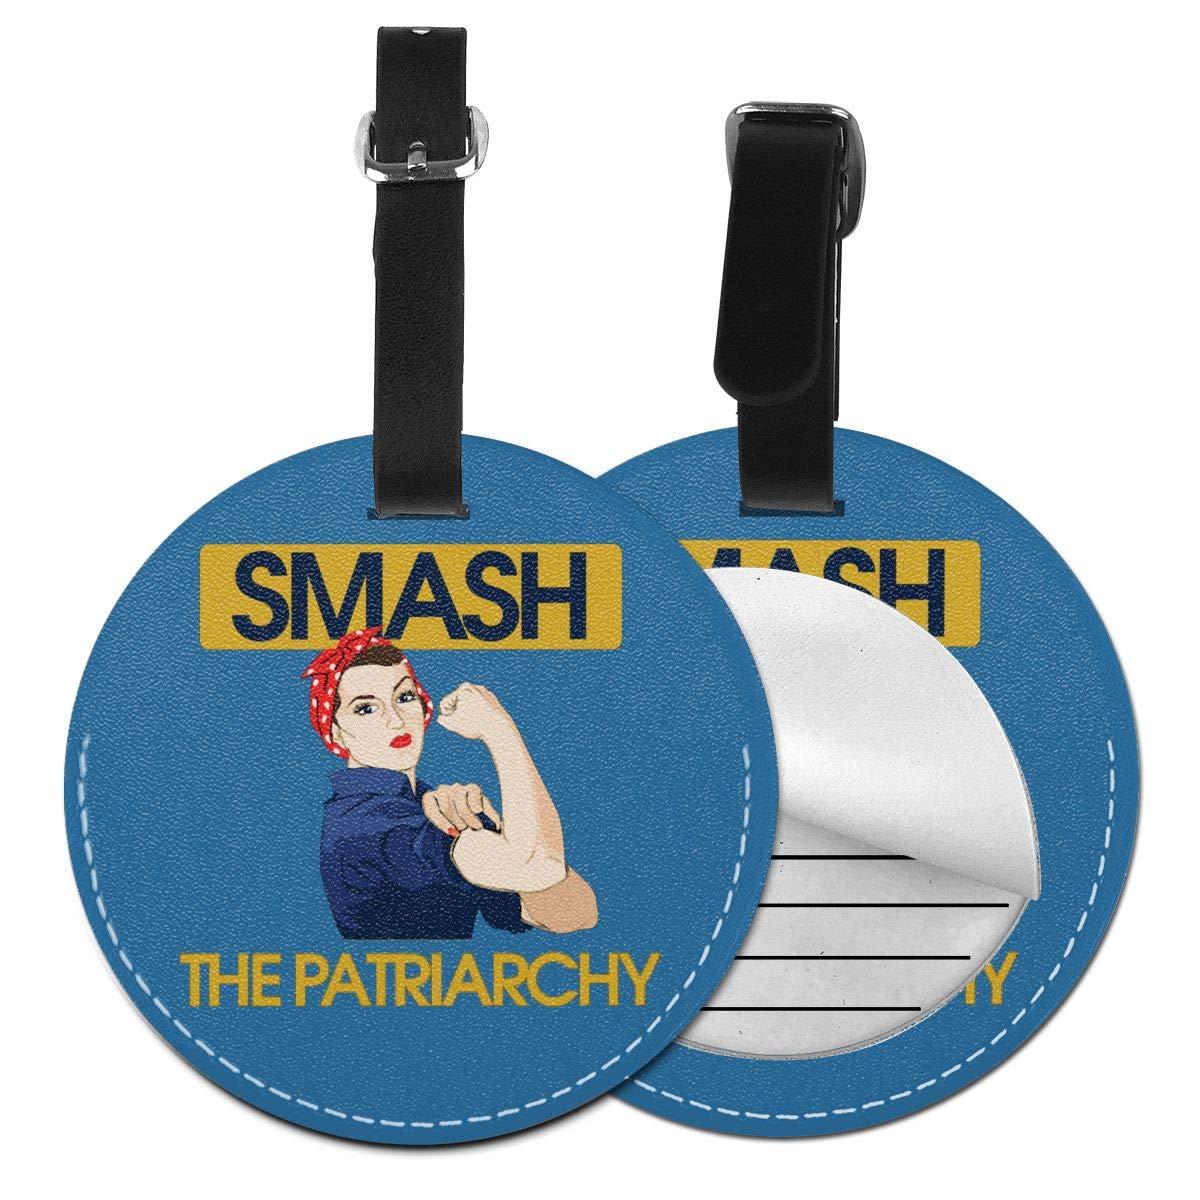 1pcs,2pcs,4pcs Smash The Patriarchy Feminist Pu Leather Double Sides Print Round Luggage Tag Mutilple Packs